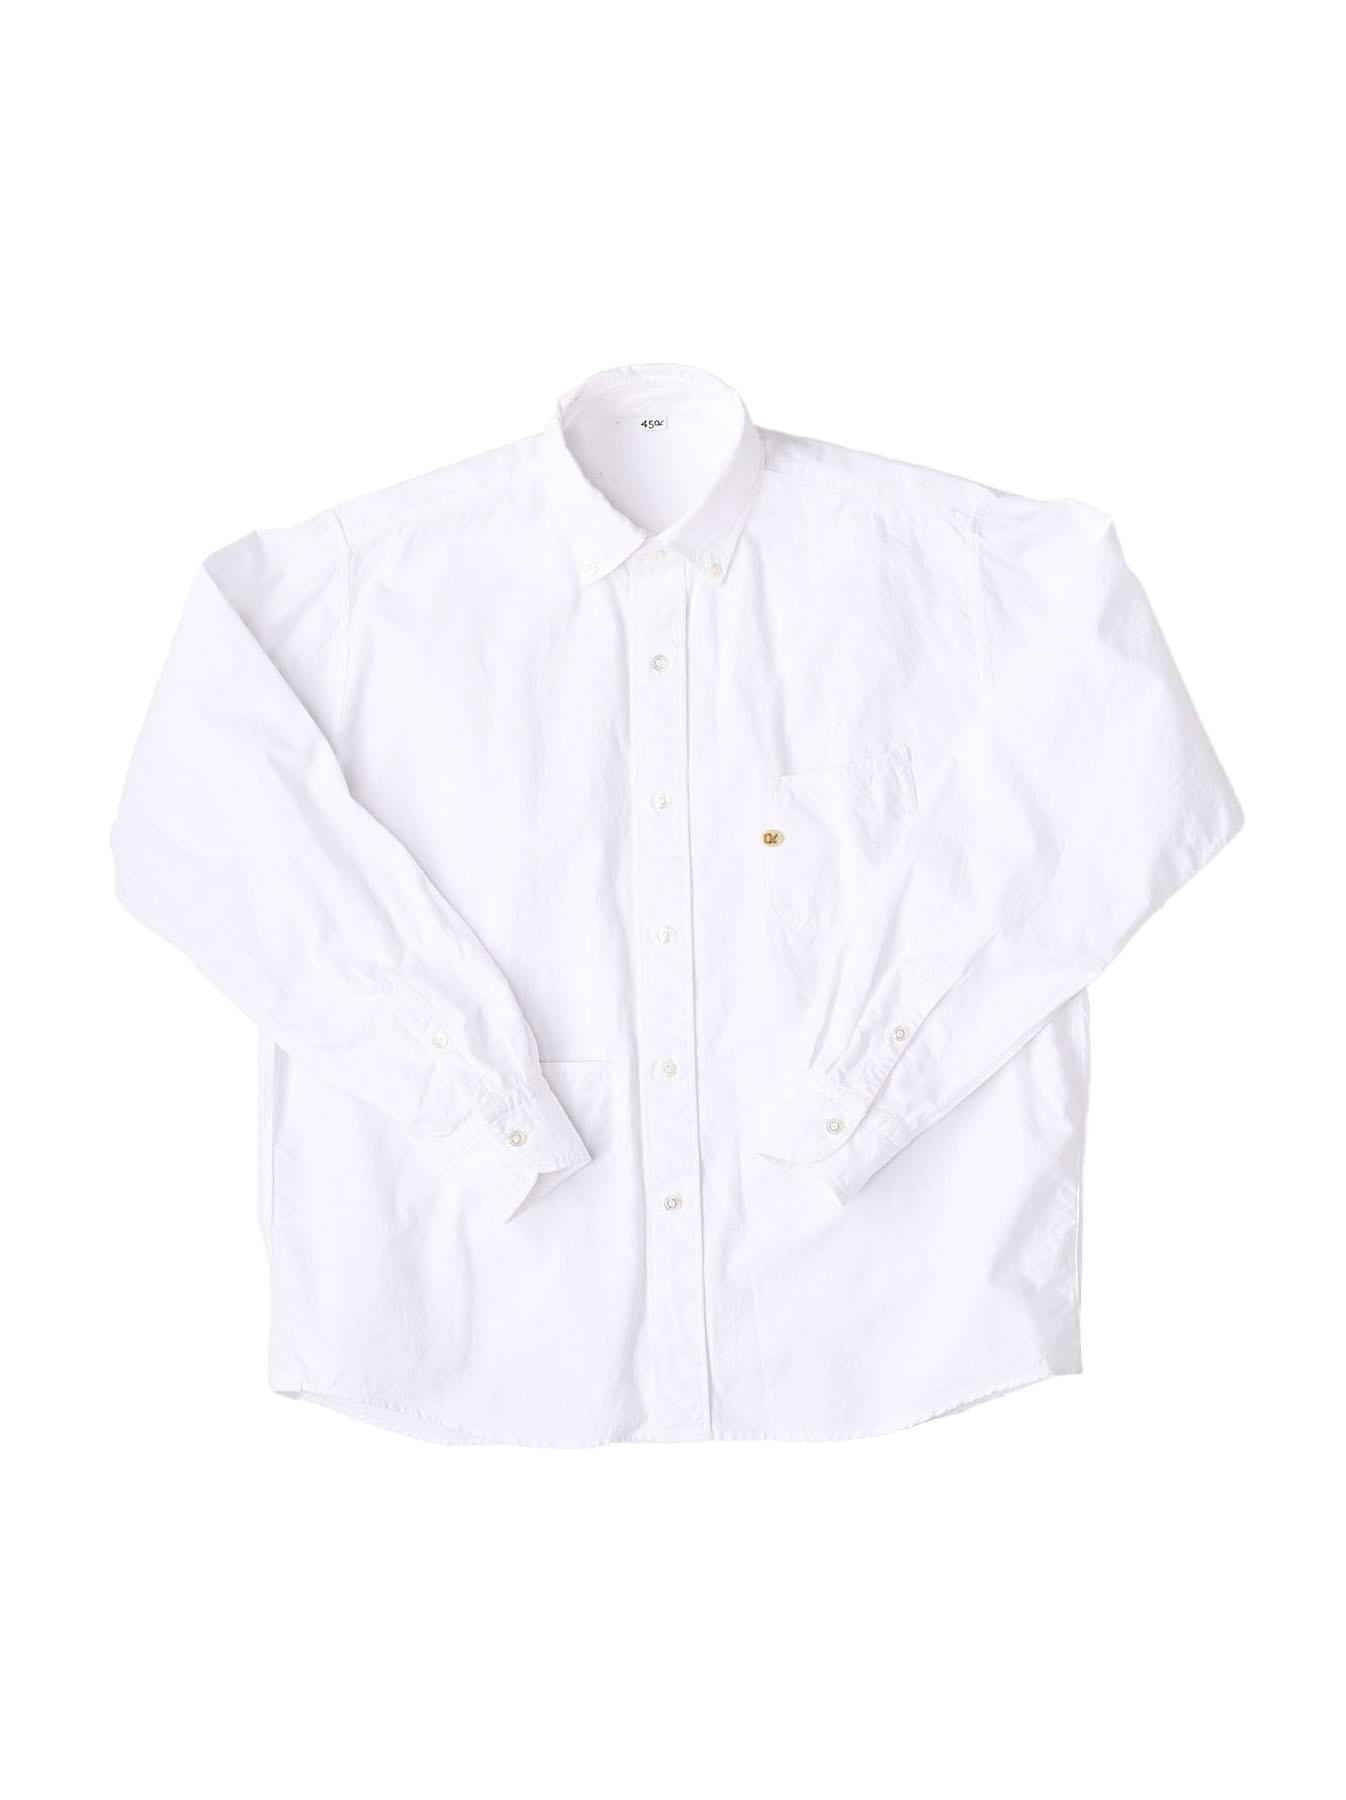 Indian Okome-hira 908 Ocean Button Down Shirt (0321)-1